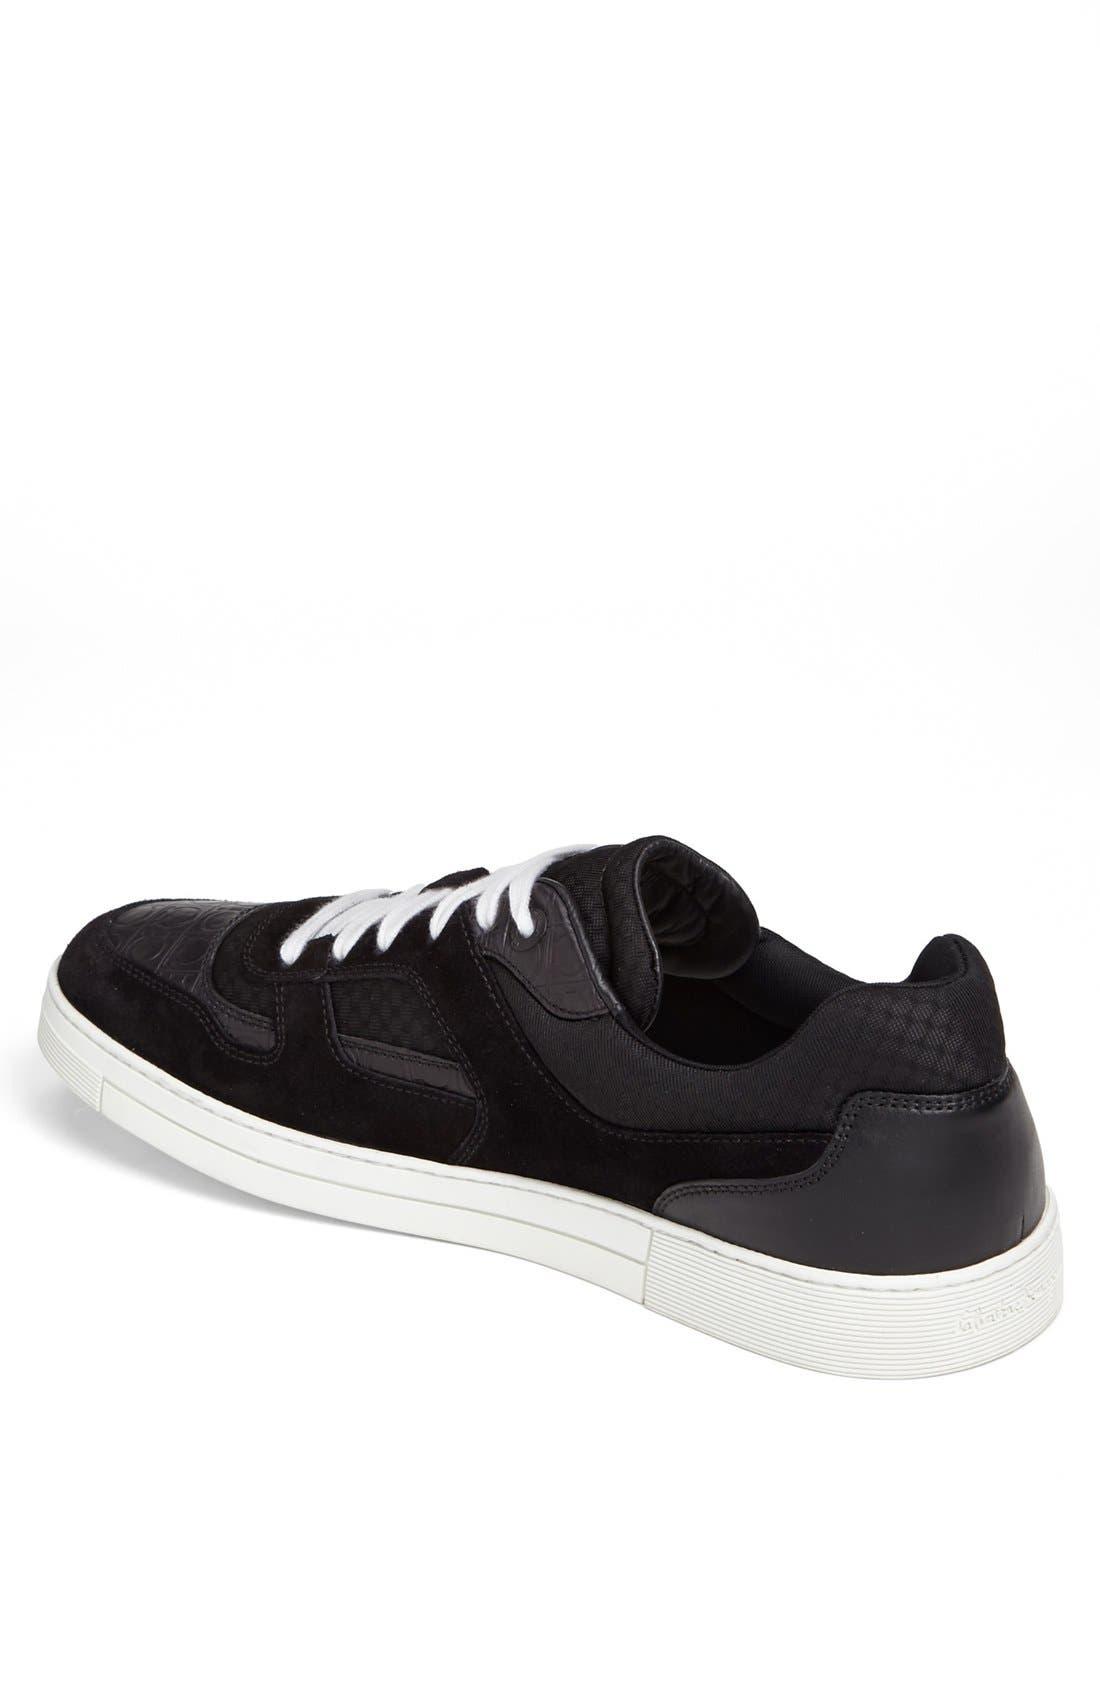 Alternate Image 2  - Salvatore Ferragamo 'Rey' Sneaker